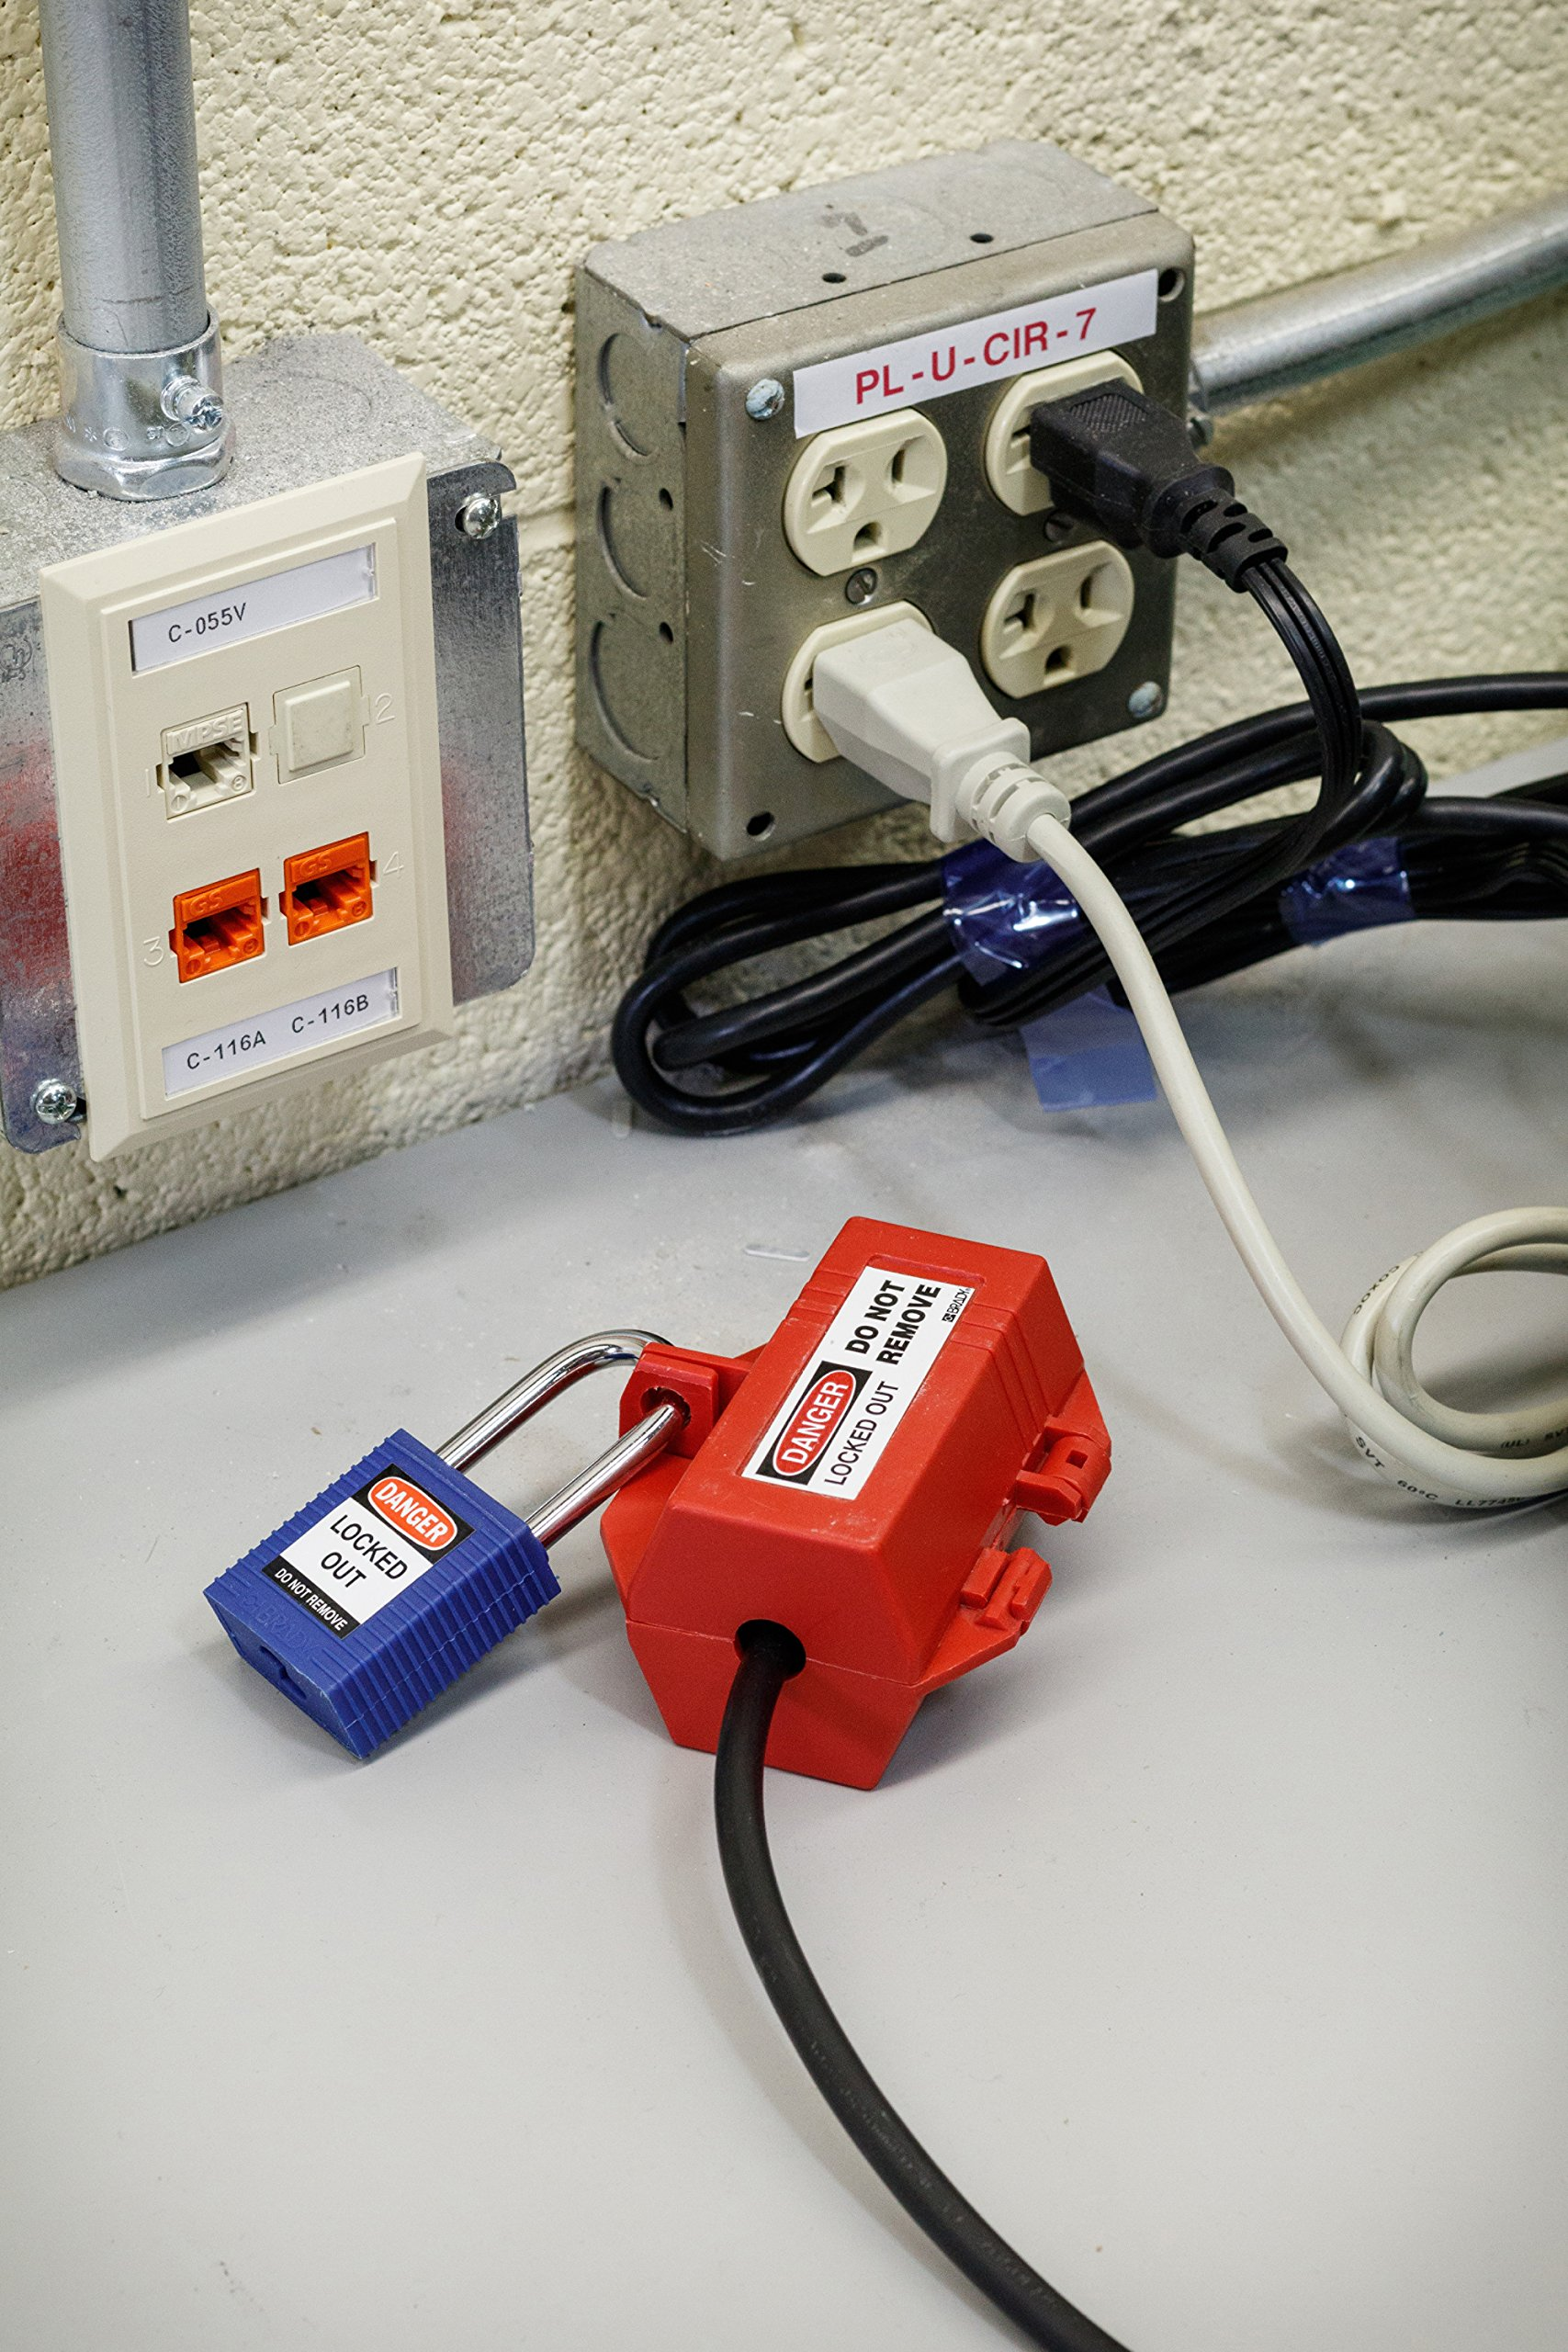 Brady 95548 Portable Lockout Kit, Fill, Electrical, Pouch by Brady (Image #4)